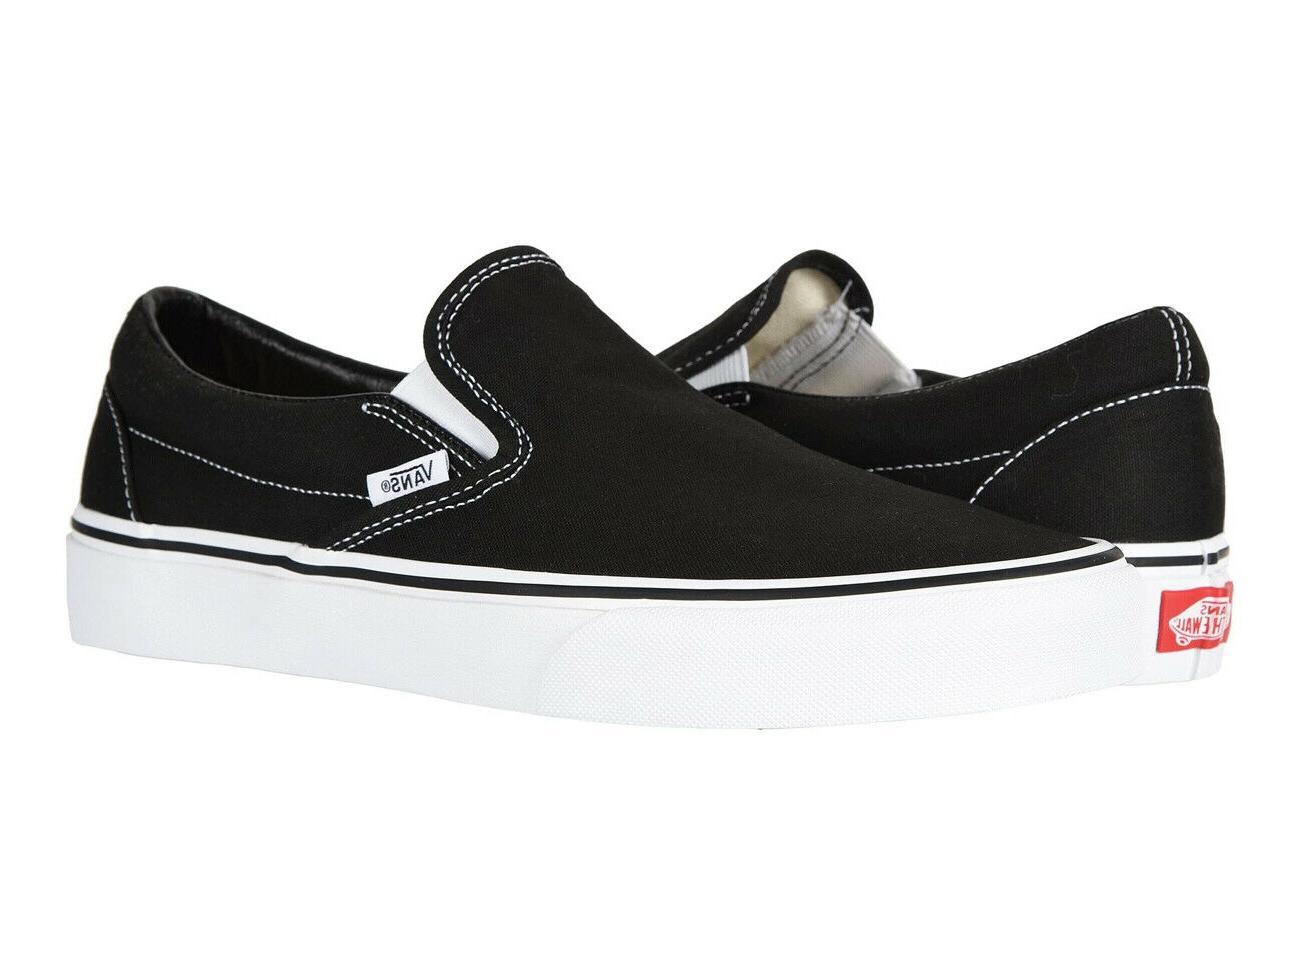 classic slip on black white unisex sneakers